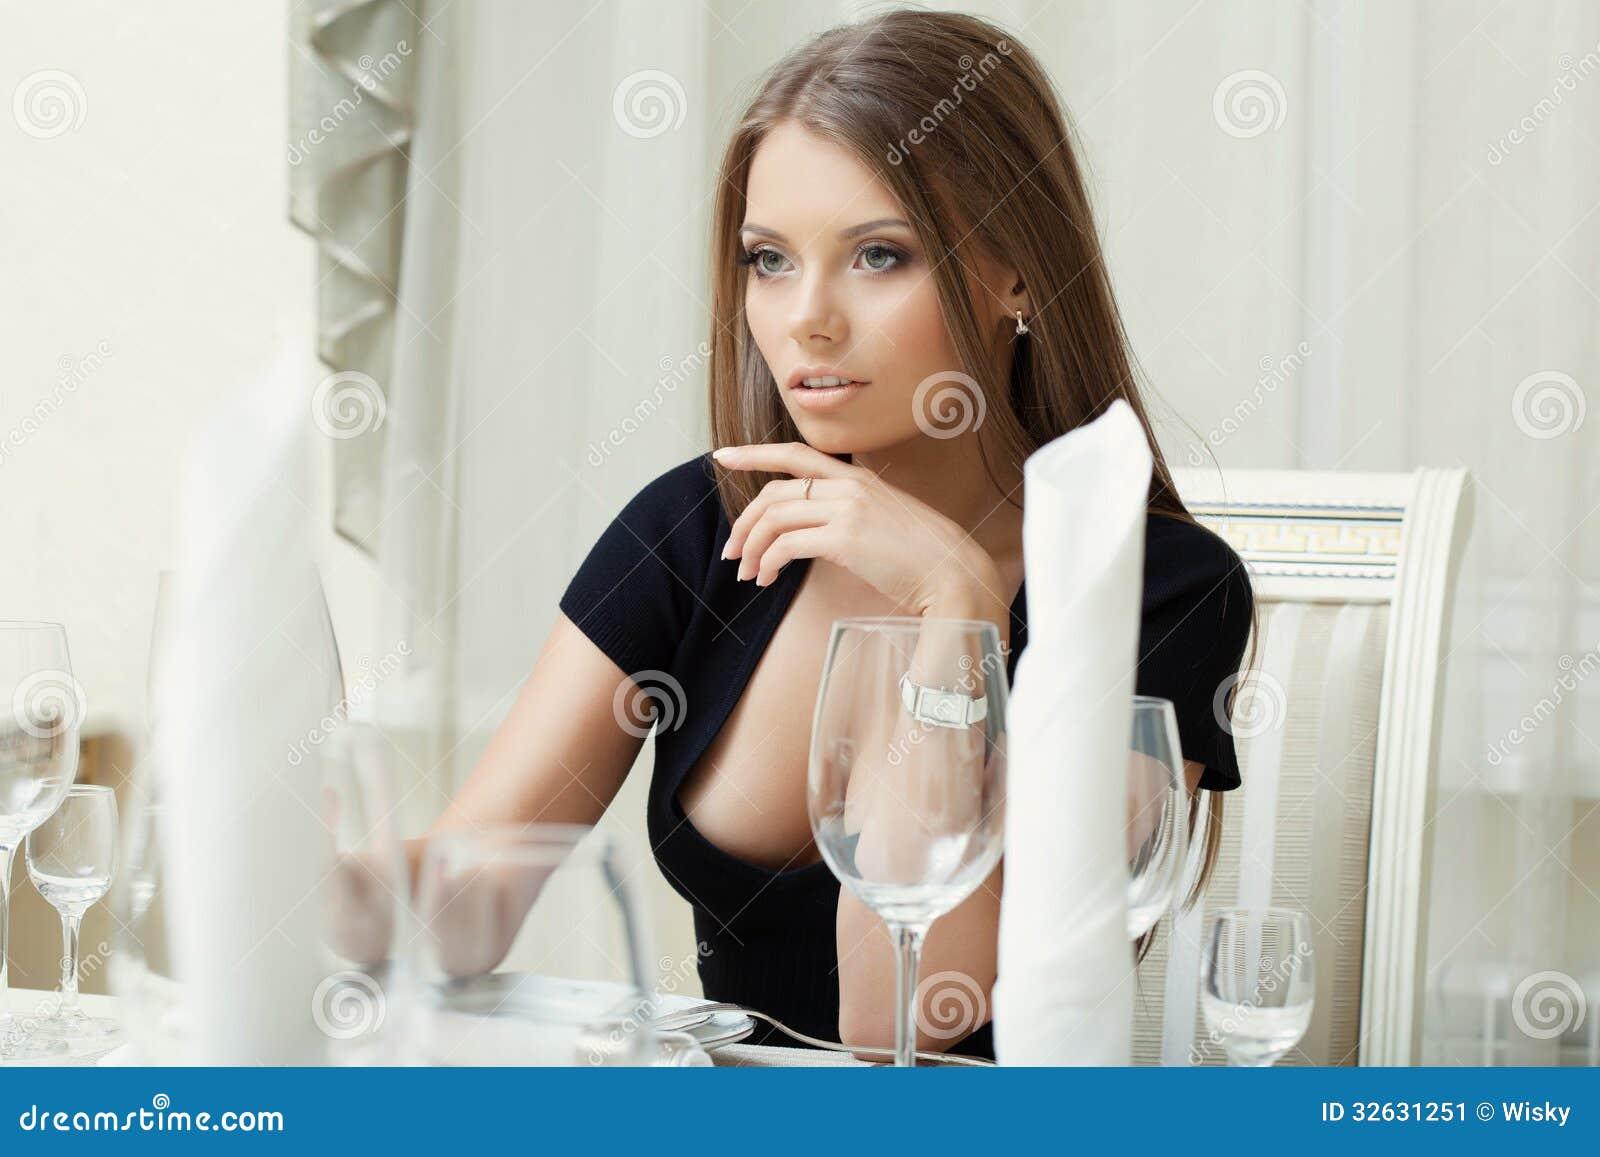 Resultado de imagen de femme seduisante